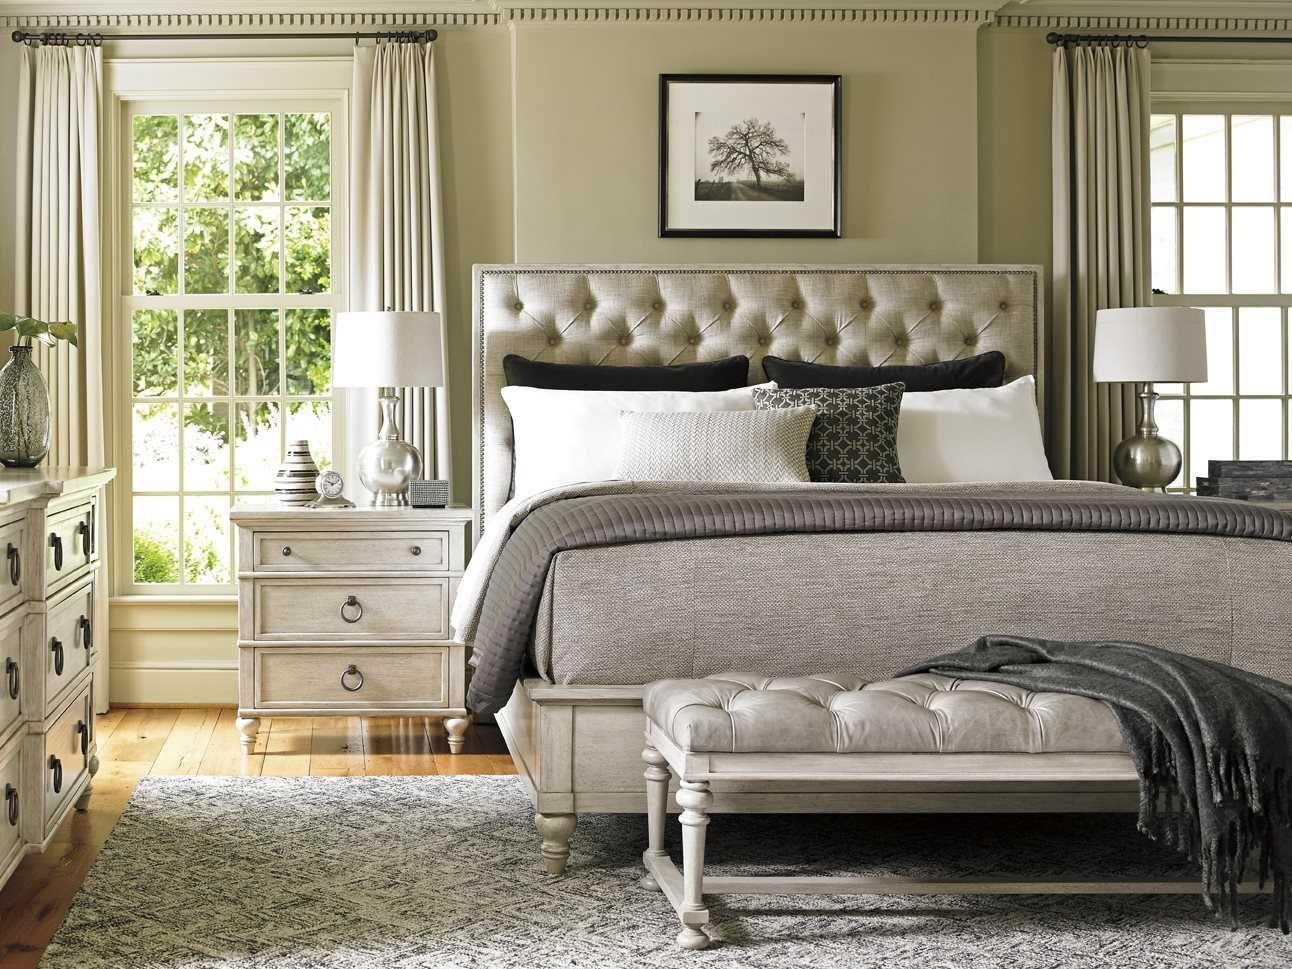 Lexington Oyster Bay Bedroom Set (With images) Lexington